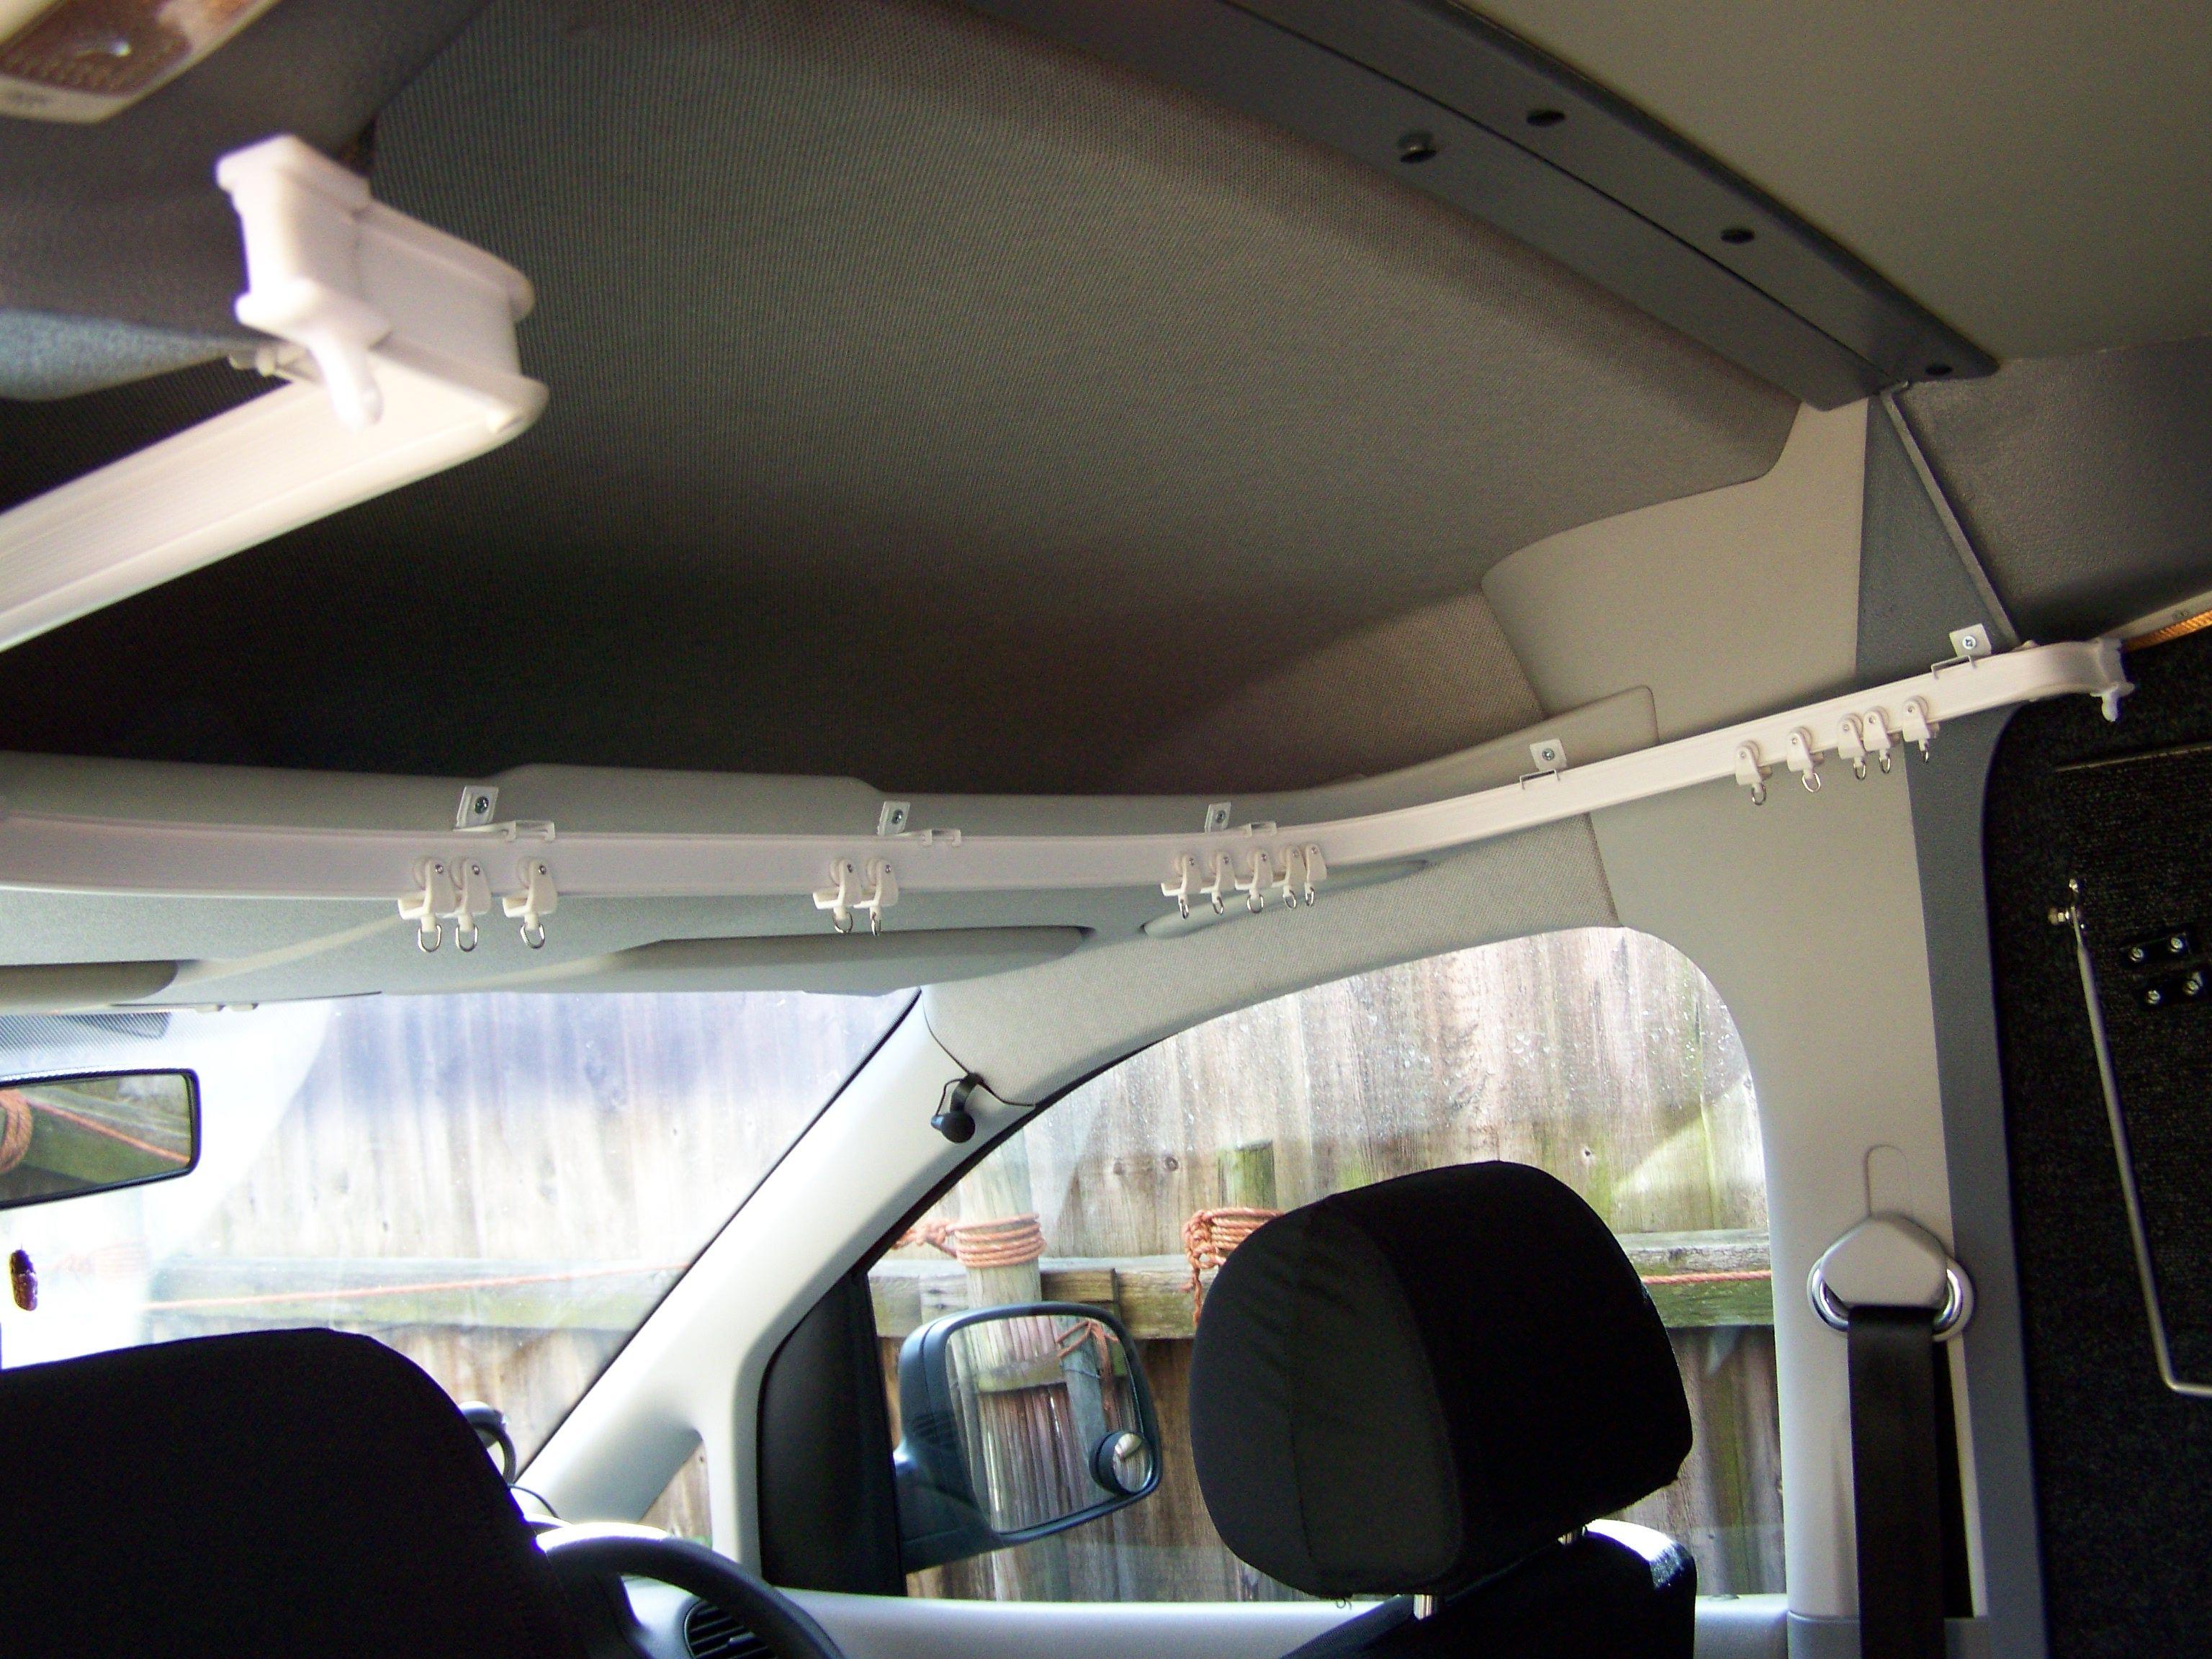 VW CADDY Solar camper front curtain rail side view   MY VW CADDY ...